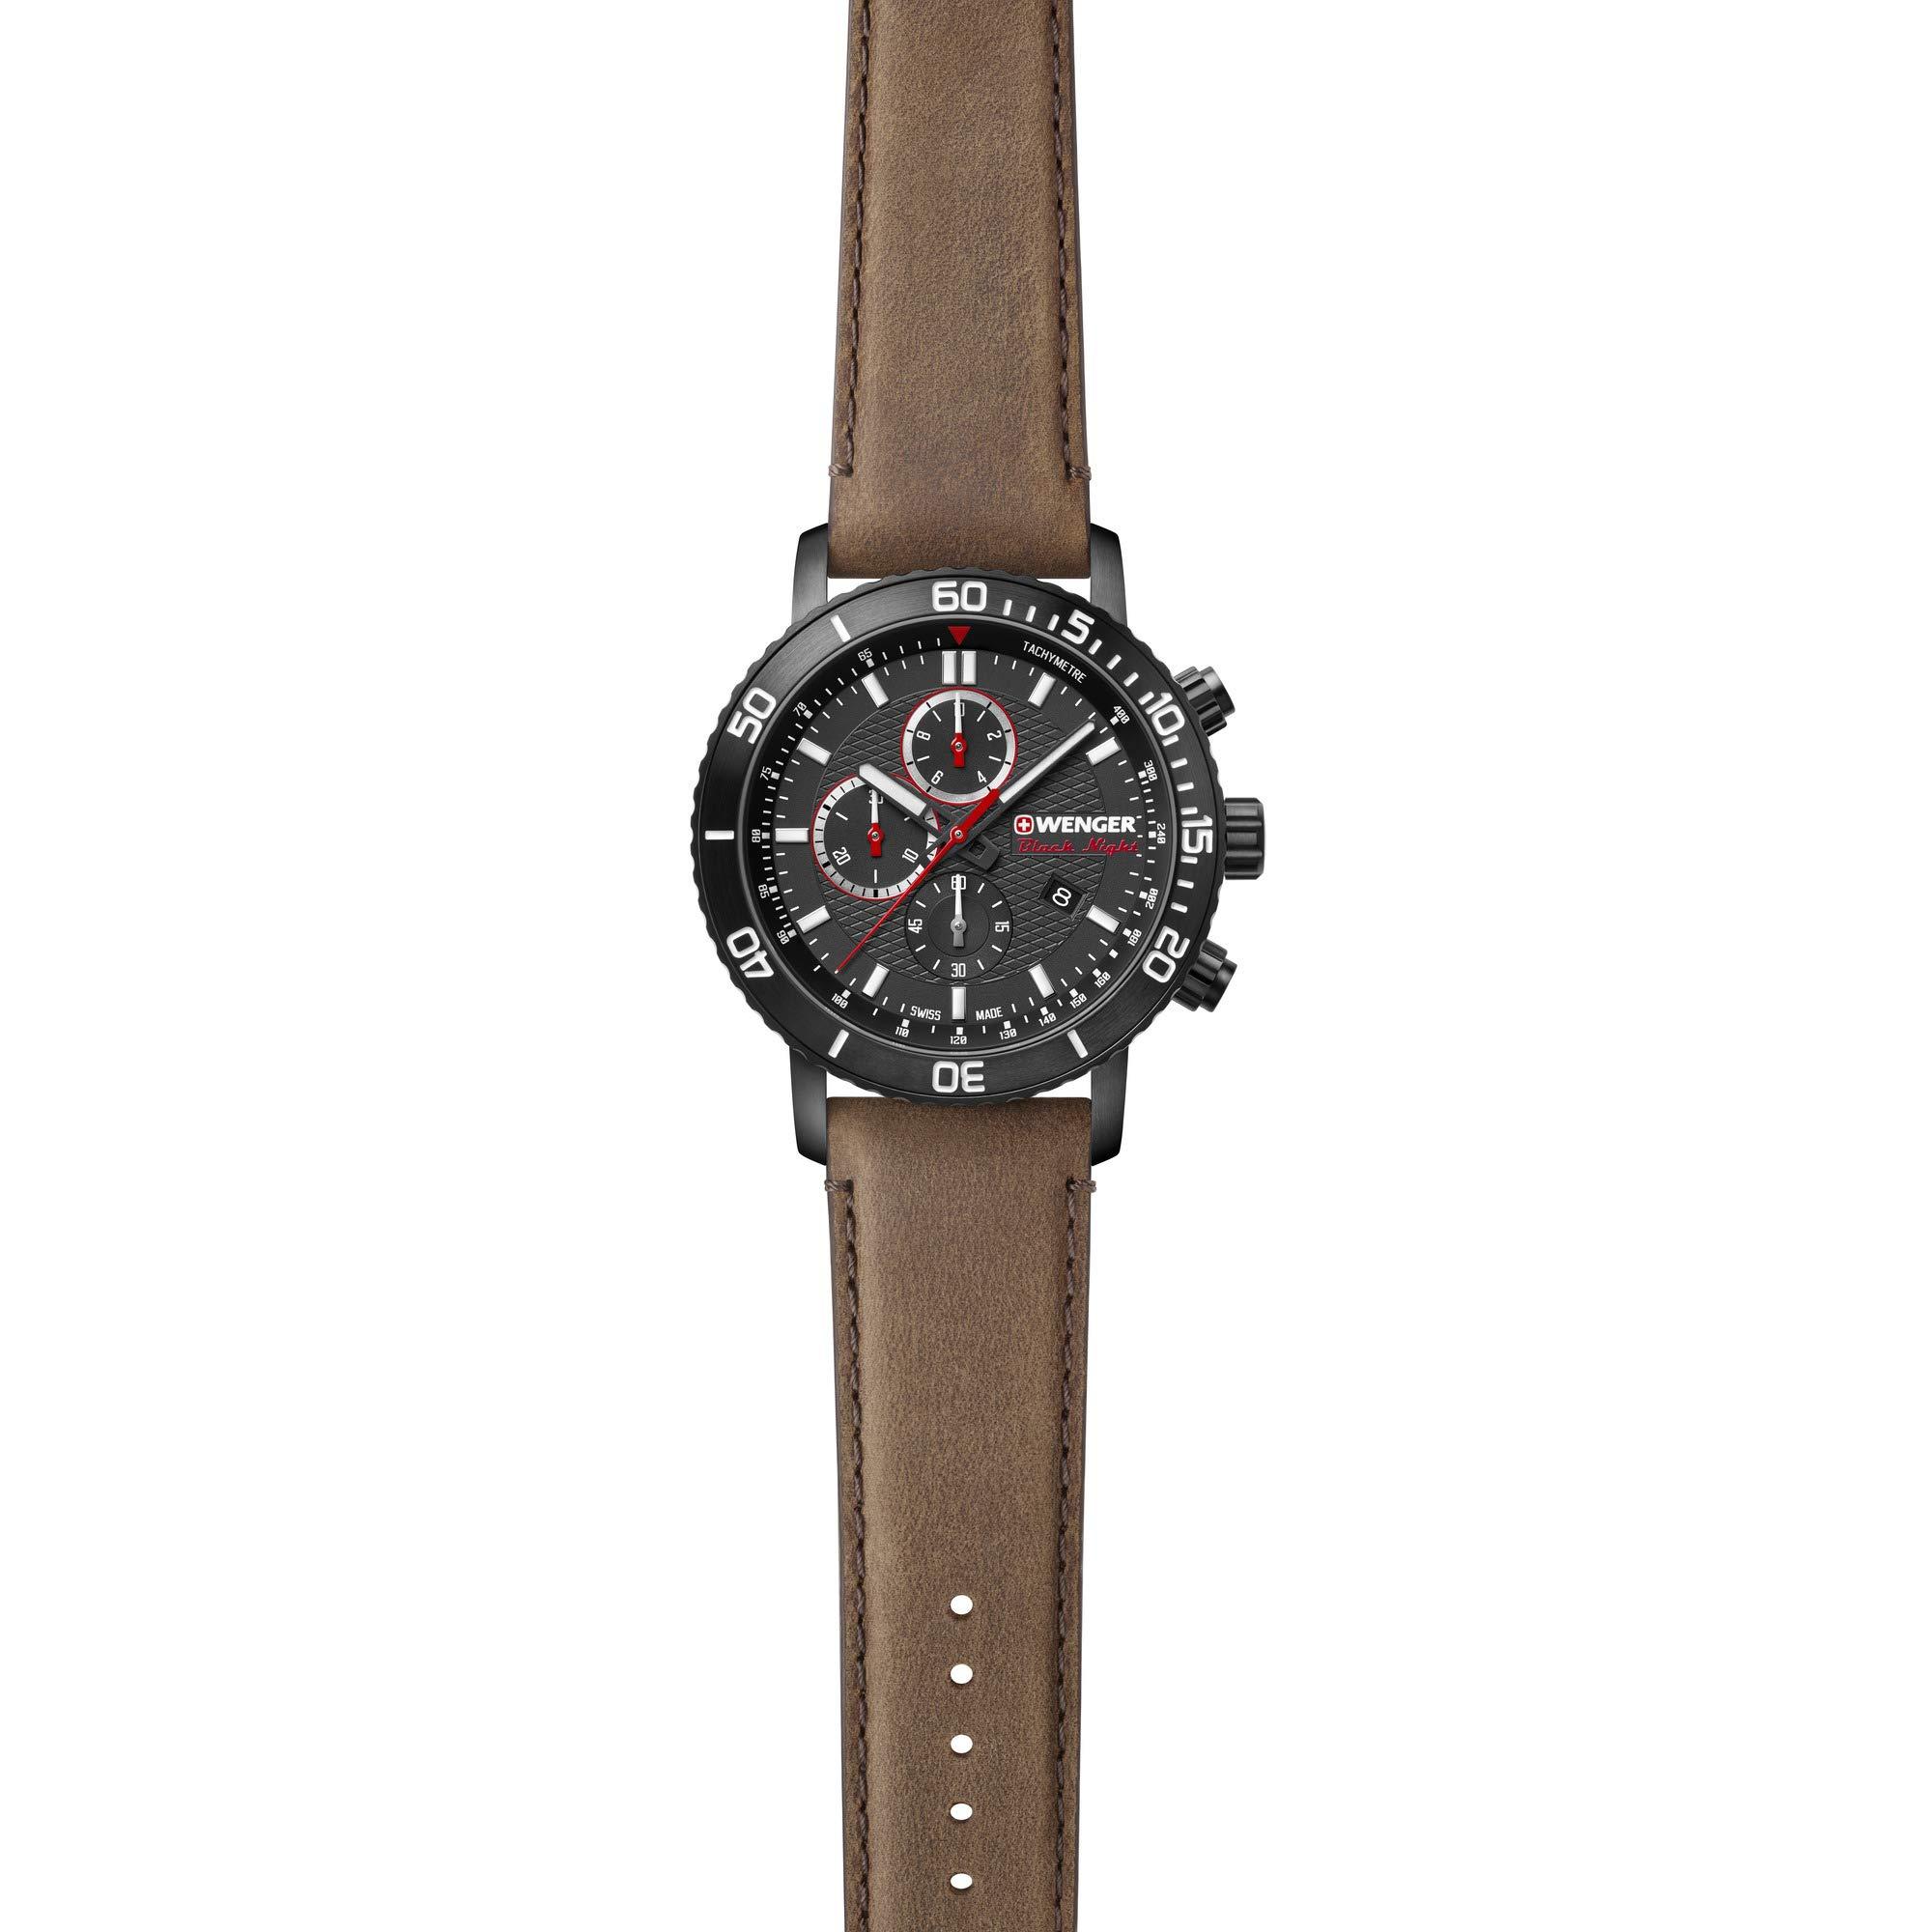 Relógio Wenger Masculino Marron - RoadSter Chrono - 01.1843.107